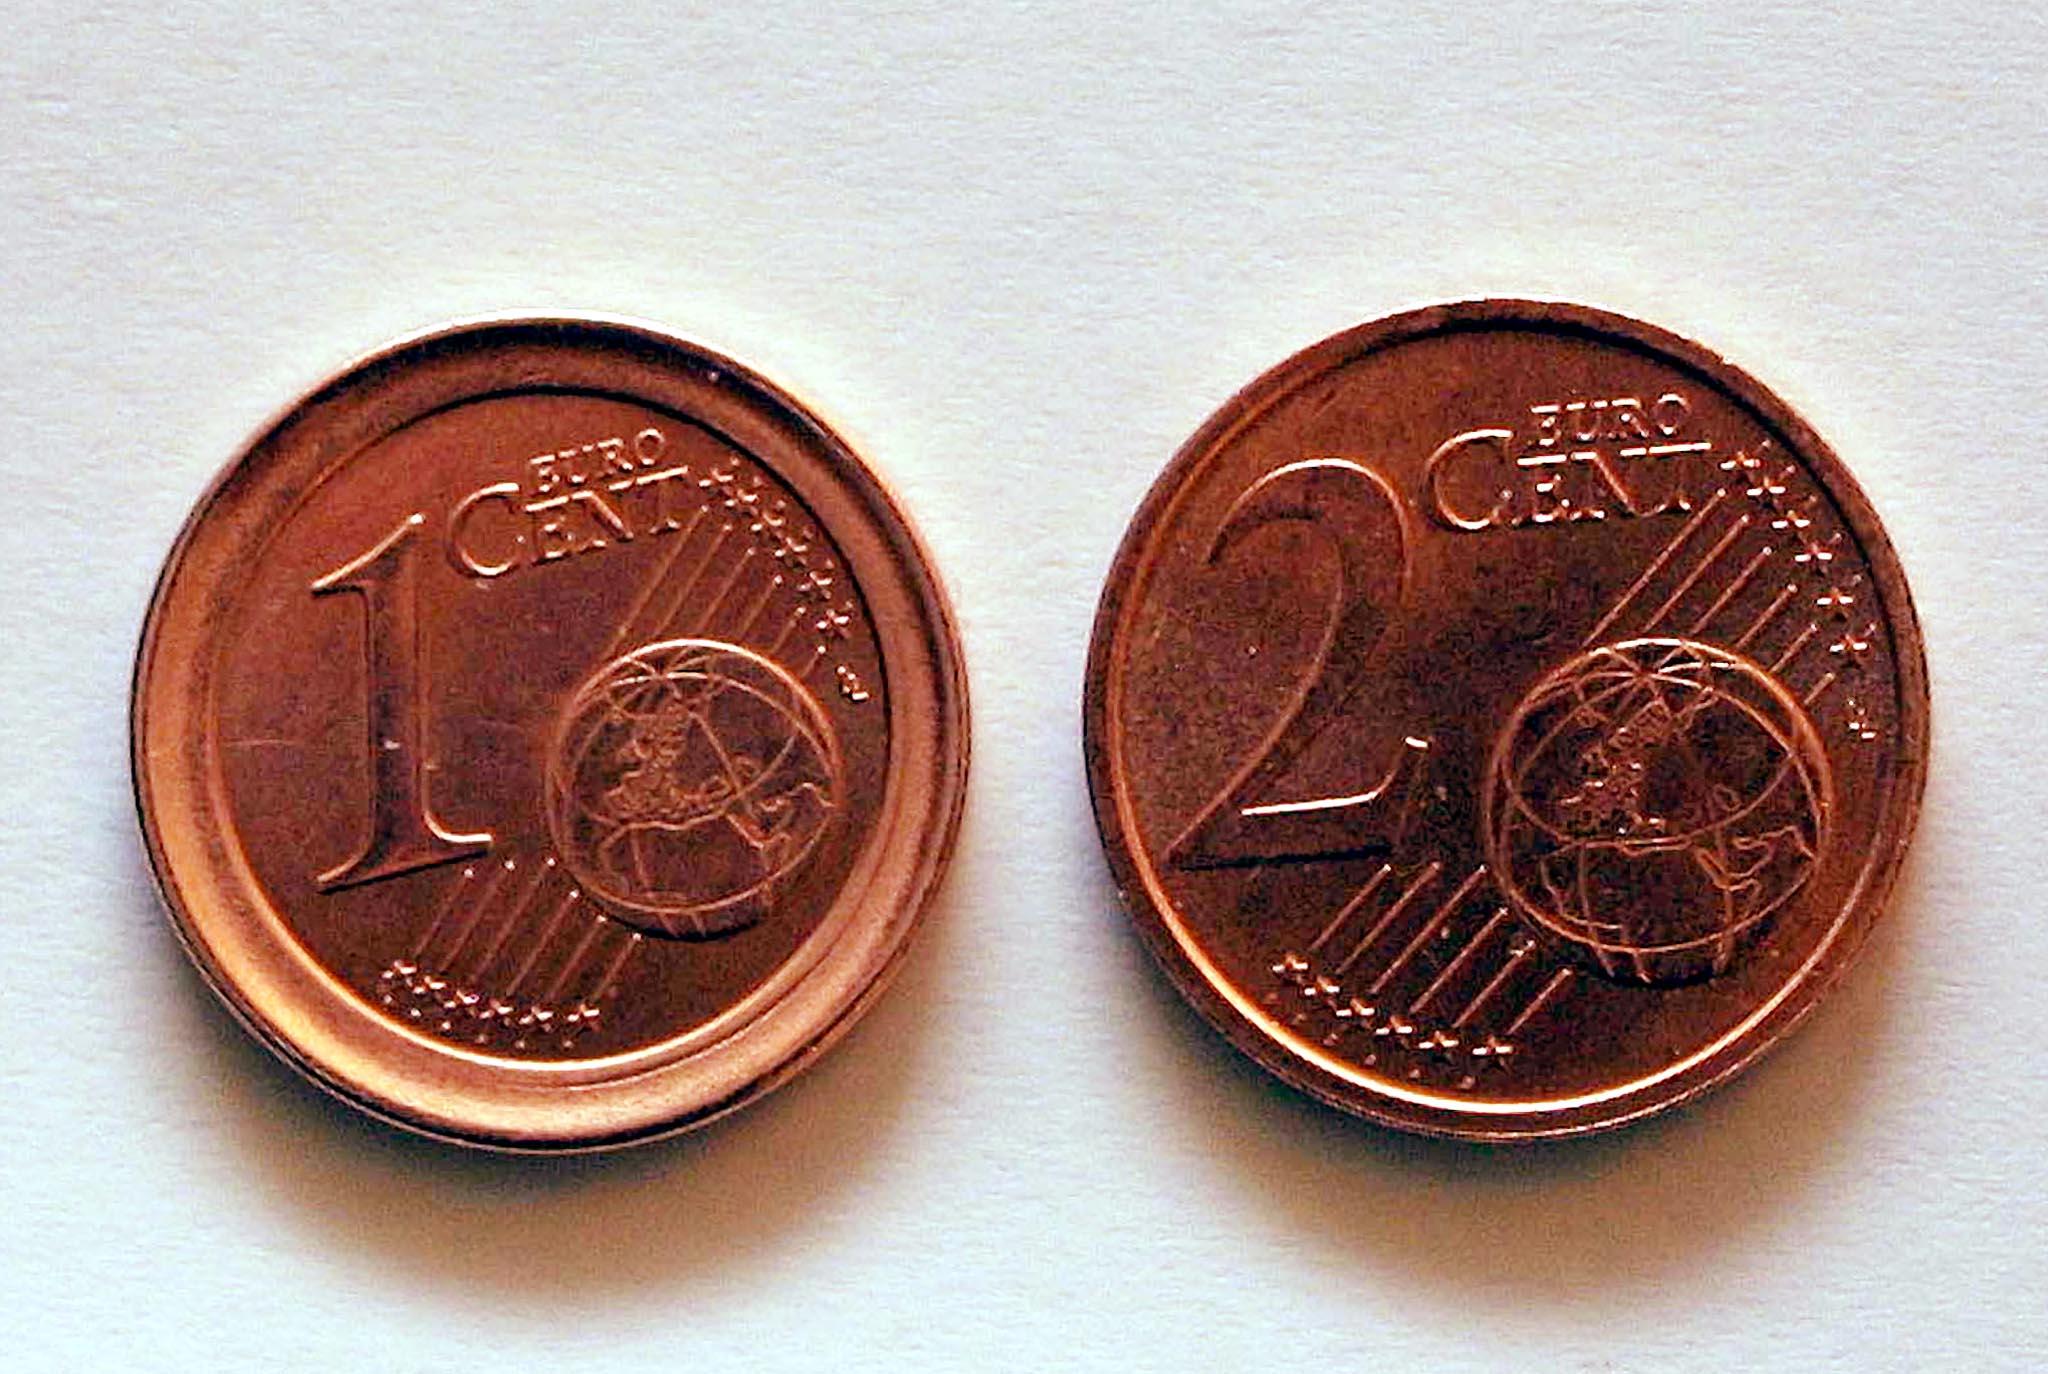 EURO: CENT ANOMALI